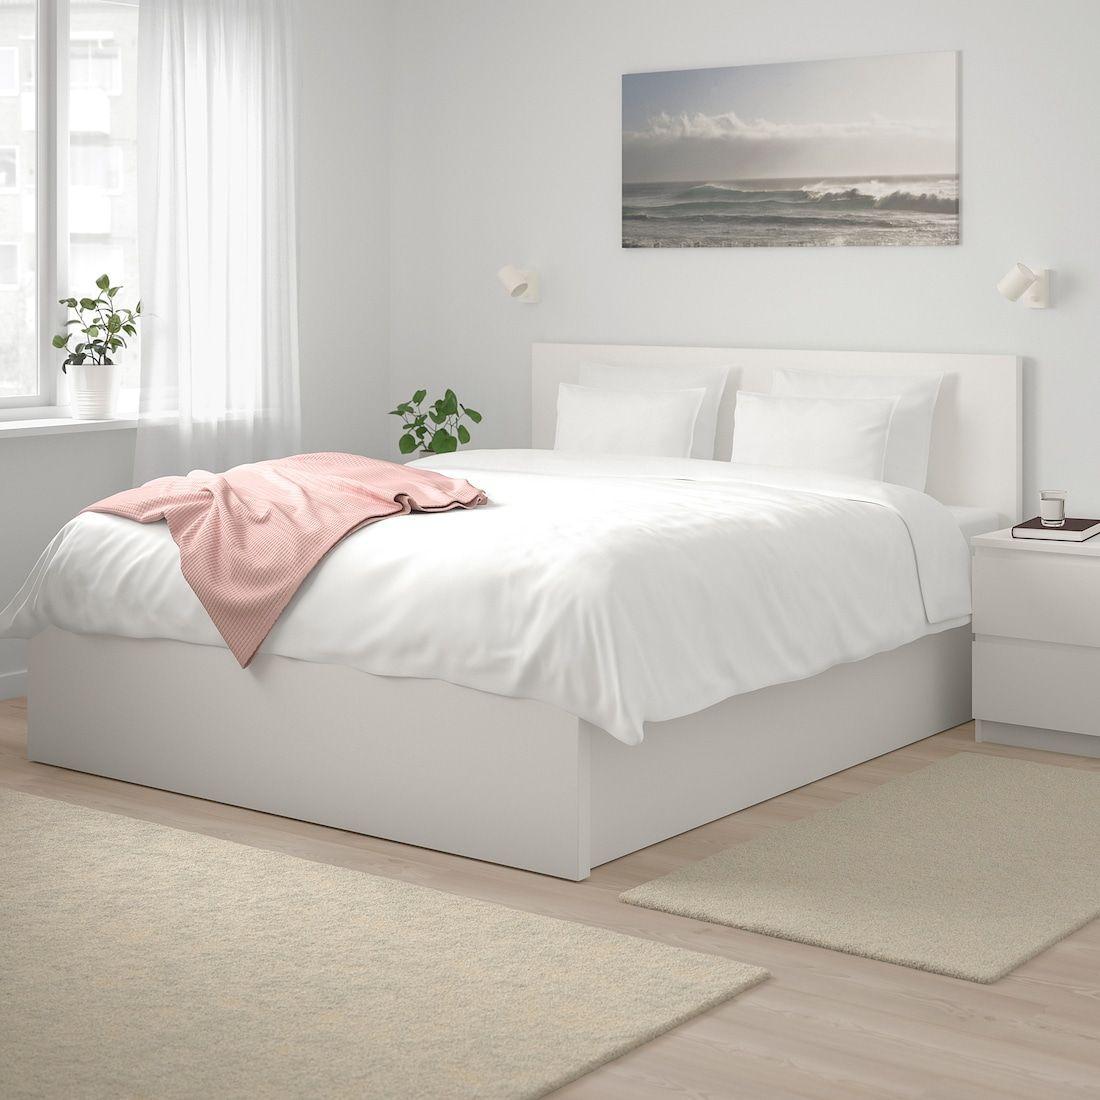 Malm Bettgestell Mit Aufbewahrung Weiss Ikea Schweiz Aufbewahrung Bettgestell Ikea Malm Mit Queenbed Schweiz In 2020 With Images White Bed Frame Malm Bed White Bedding